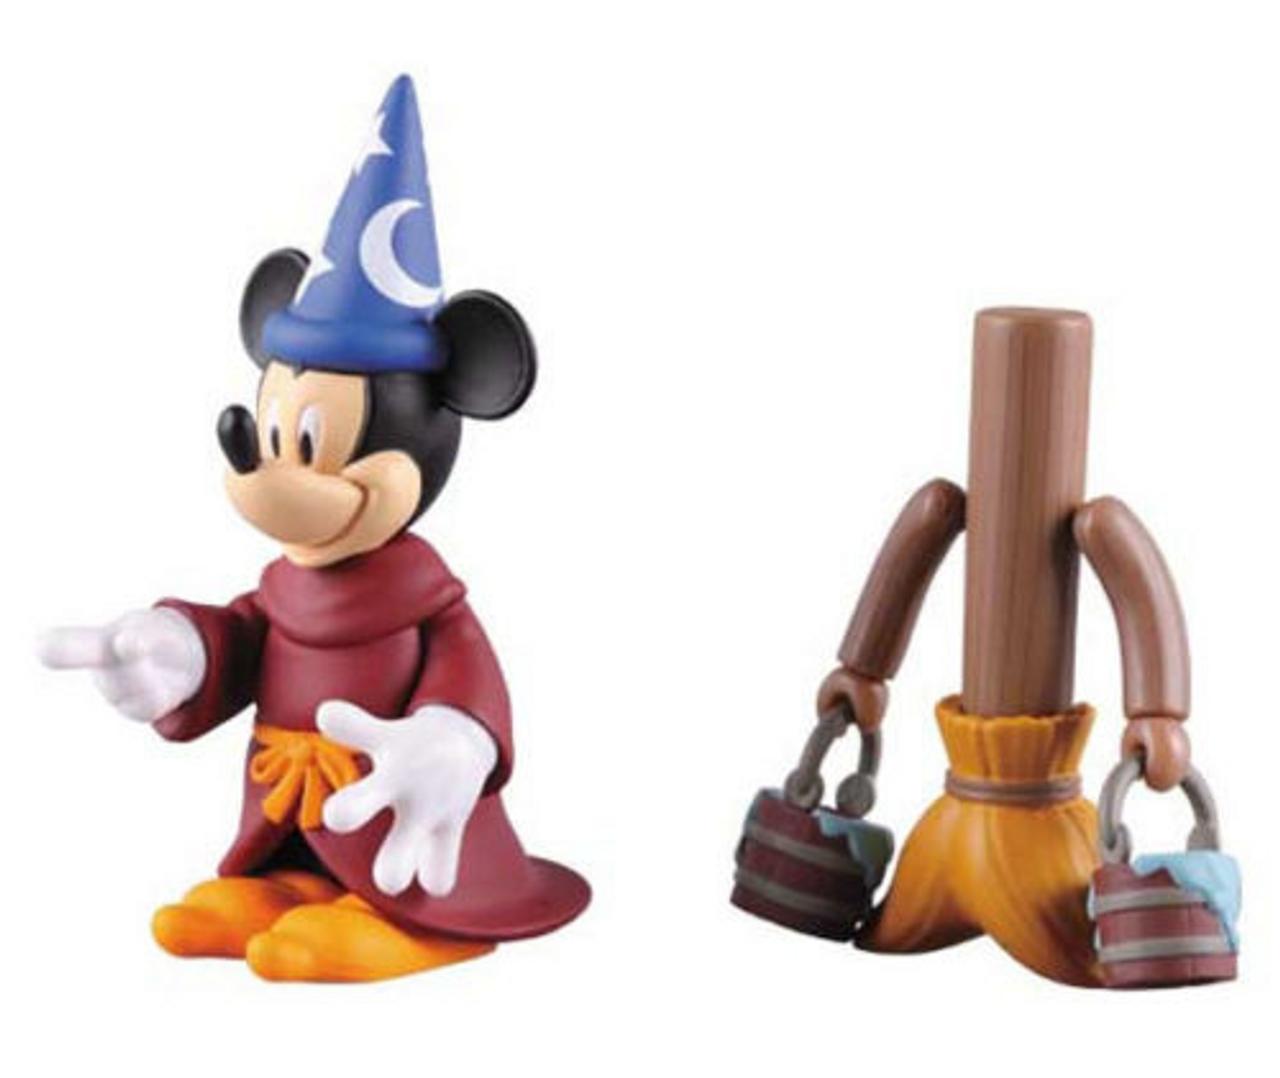 Medicom Kubrick 272 Mickey Mouse Broom Fantasia Version 4530956172729 Plaza Japan